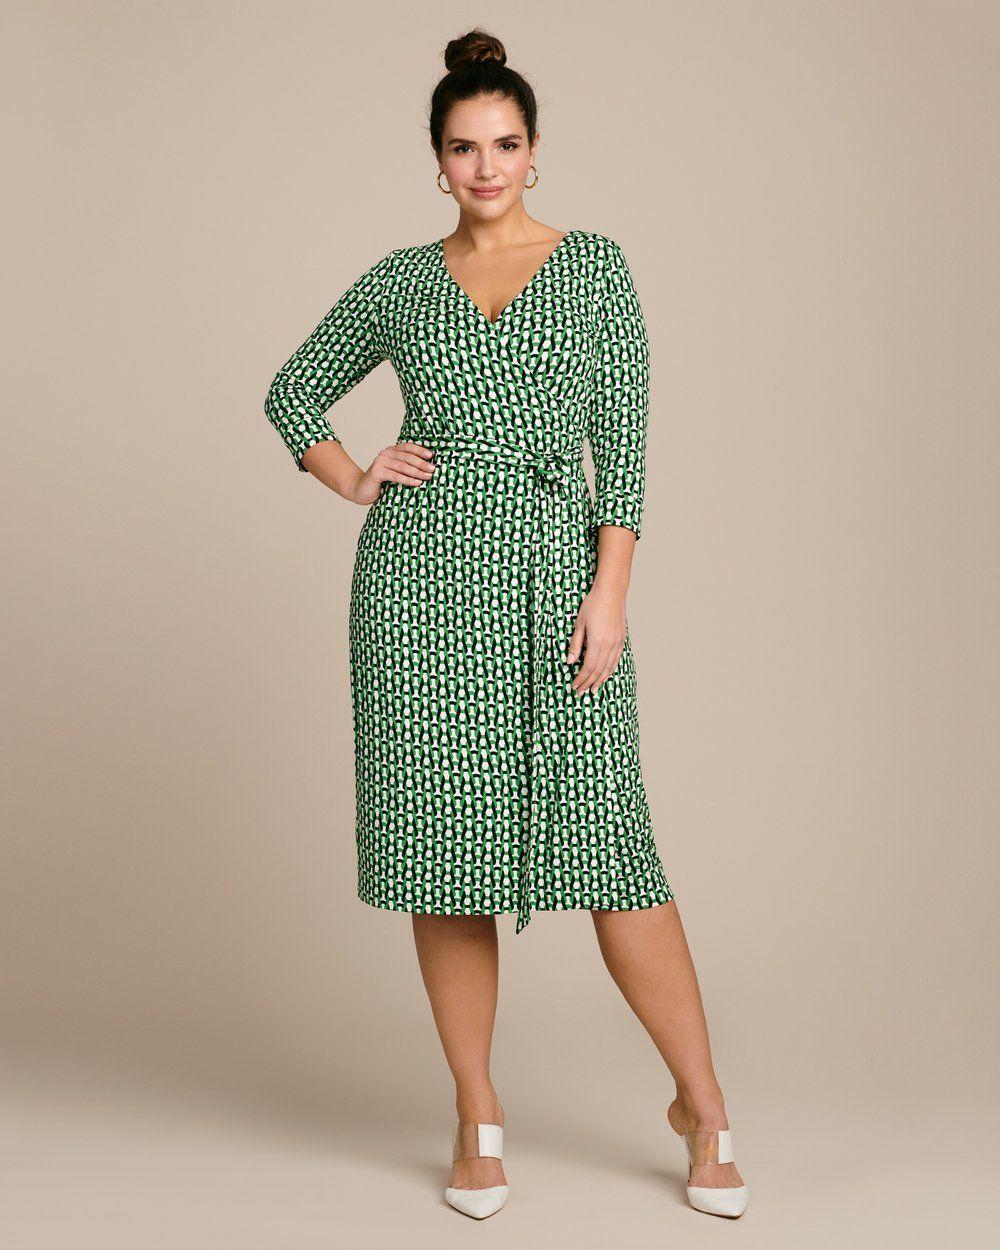 New Julian Two Classic Wrap Dvf Wrap Dress Diane Von Furstenberg Wrap Dress Simple Outfits [ 1250 x 1000 Pixel ]